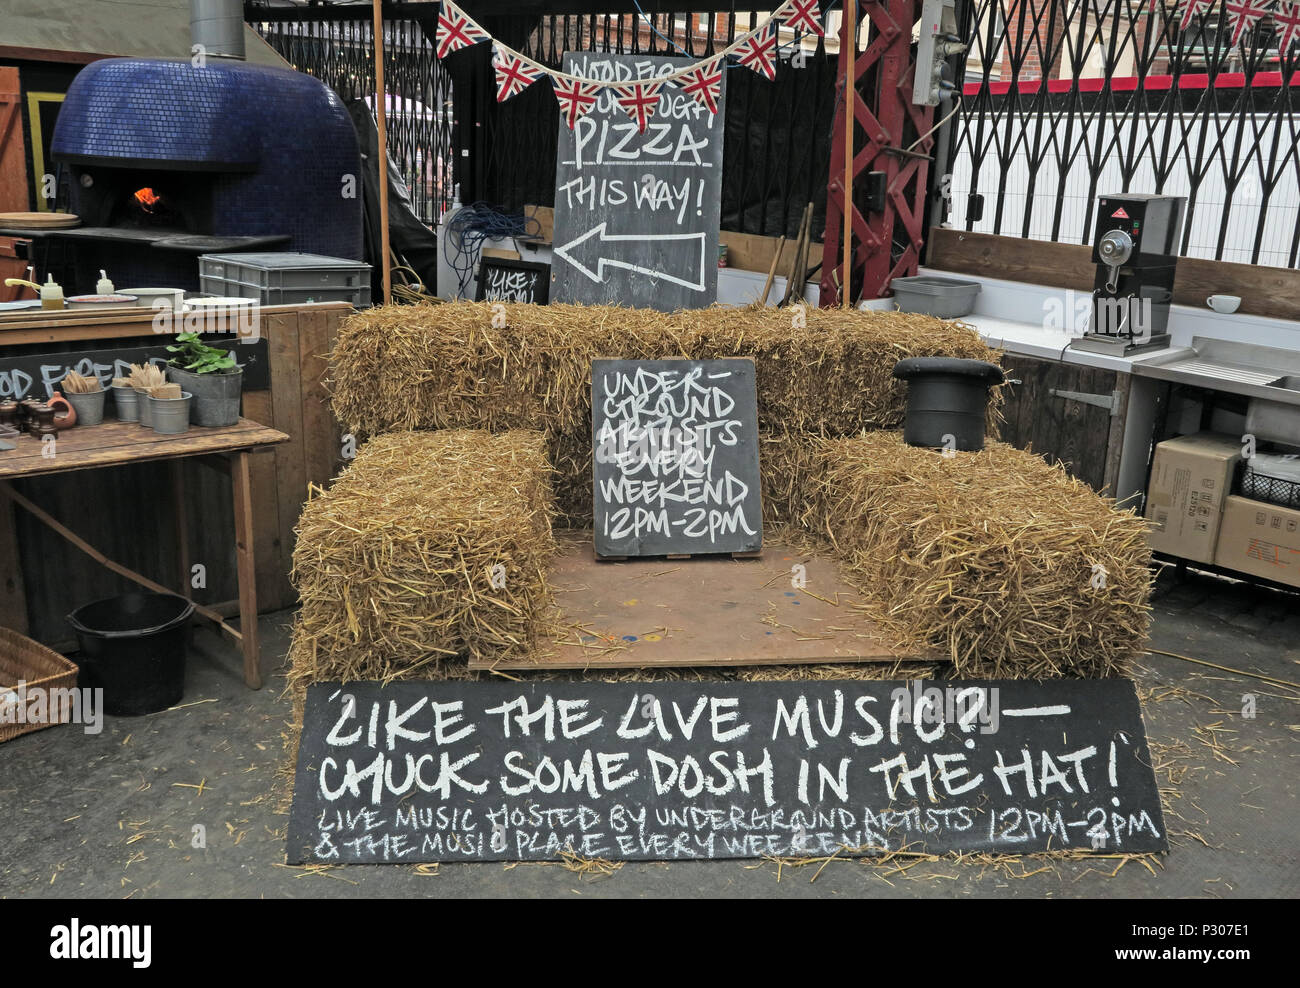 GoTonysmith,@HotpixUK,Trafford,Cheshire,town,centre,shopping,retail,Live